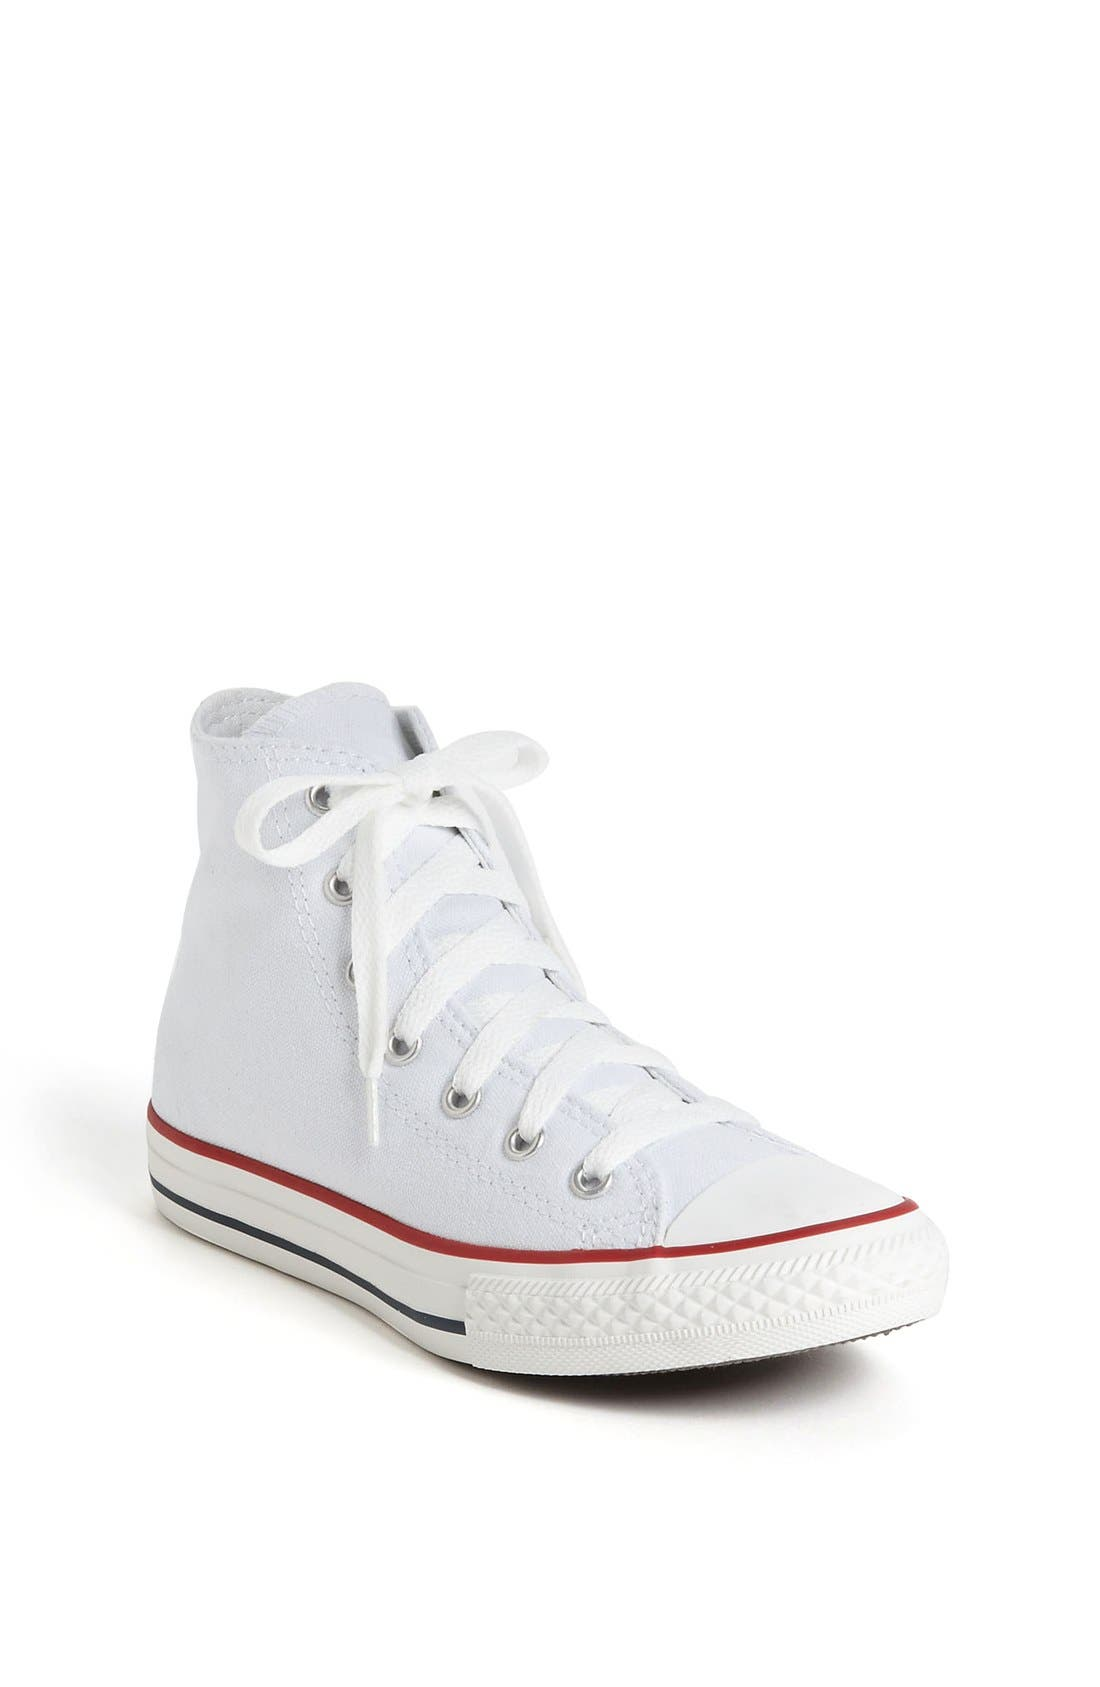 Chuck Taylor<sup>®</sup> High Top Sneaker,                             Main thumbnail 1, color,                             Optic White